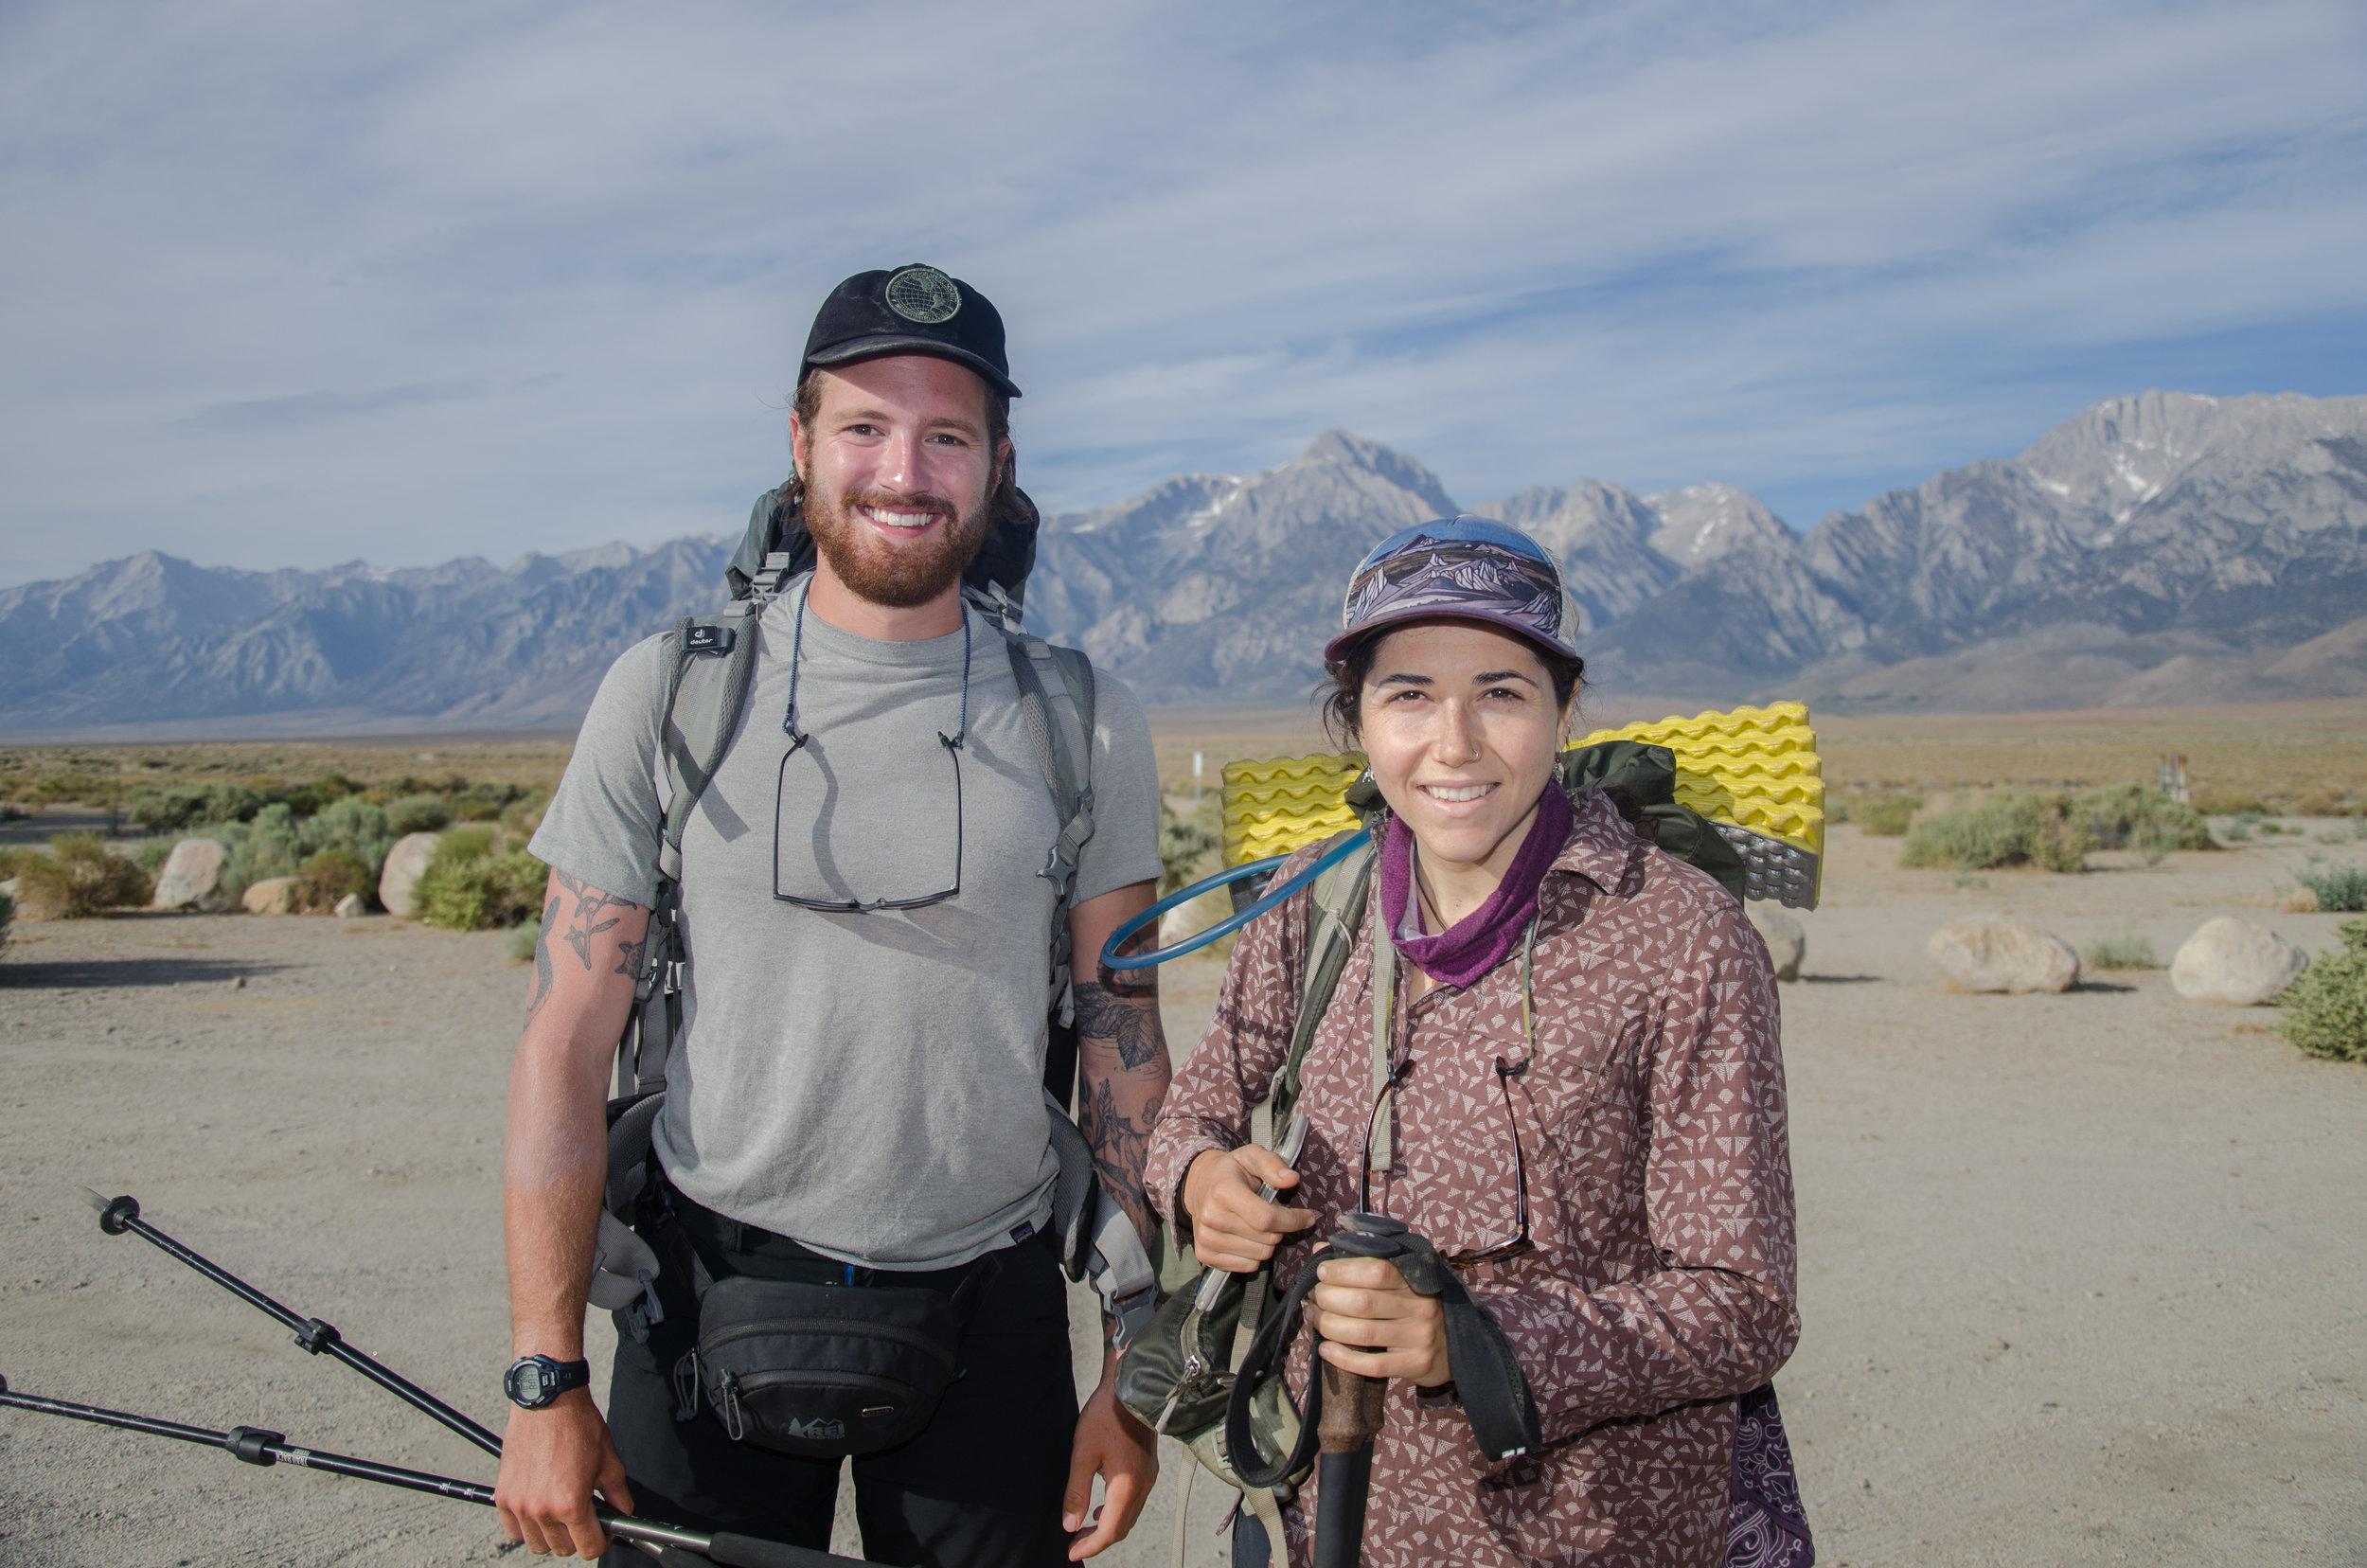 JMT Hikers Nina and friend